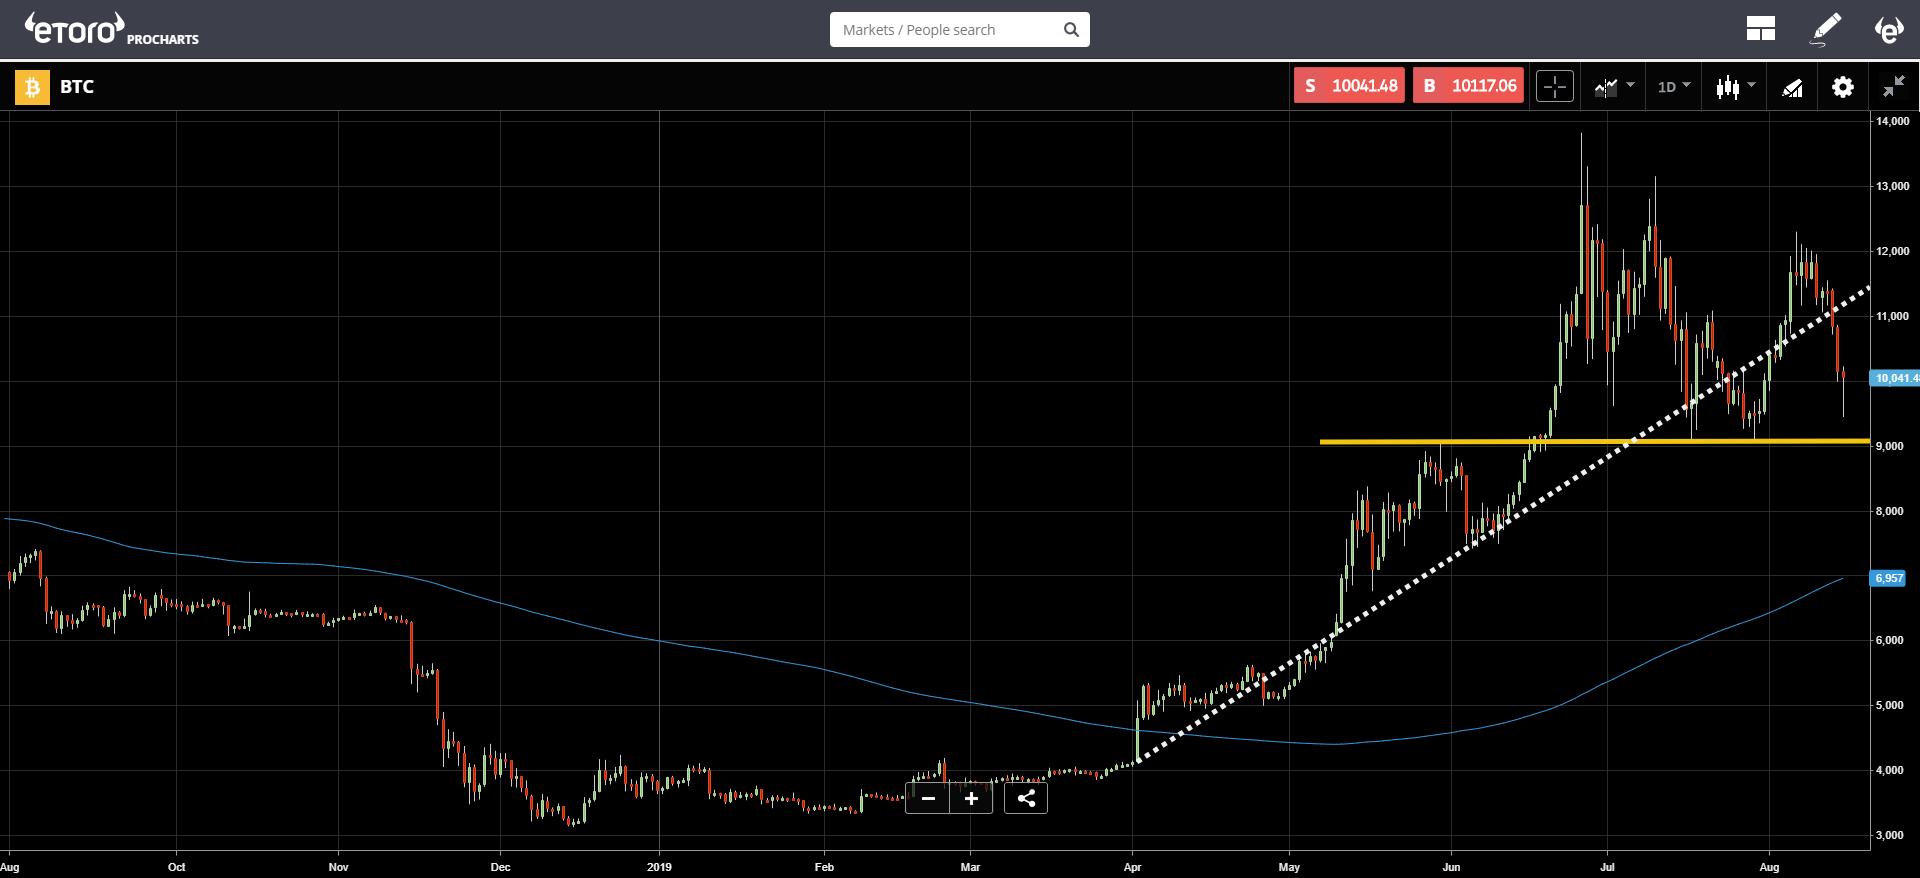 market, crypto, cryptocurrency, bitcoin, blockchain, ethereum, trading, fed, stocks, economy